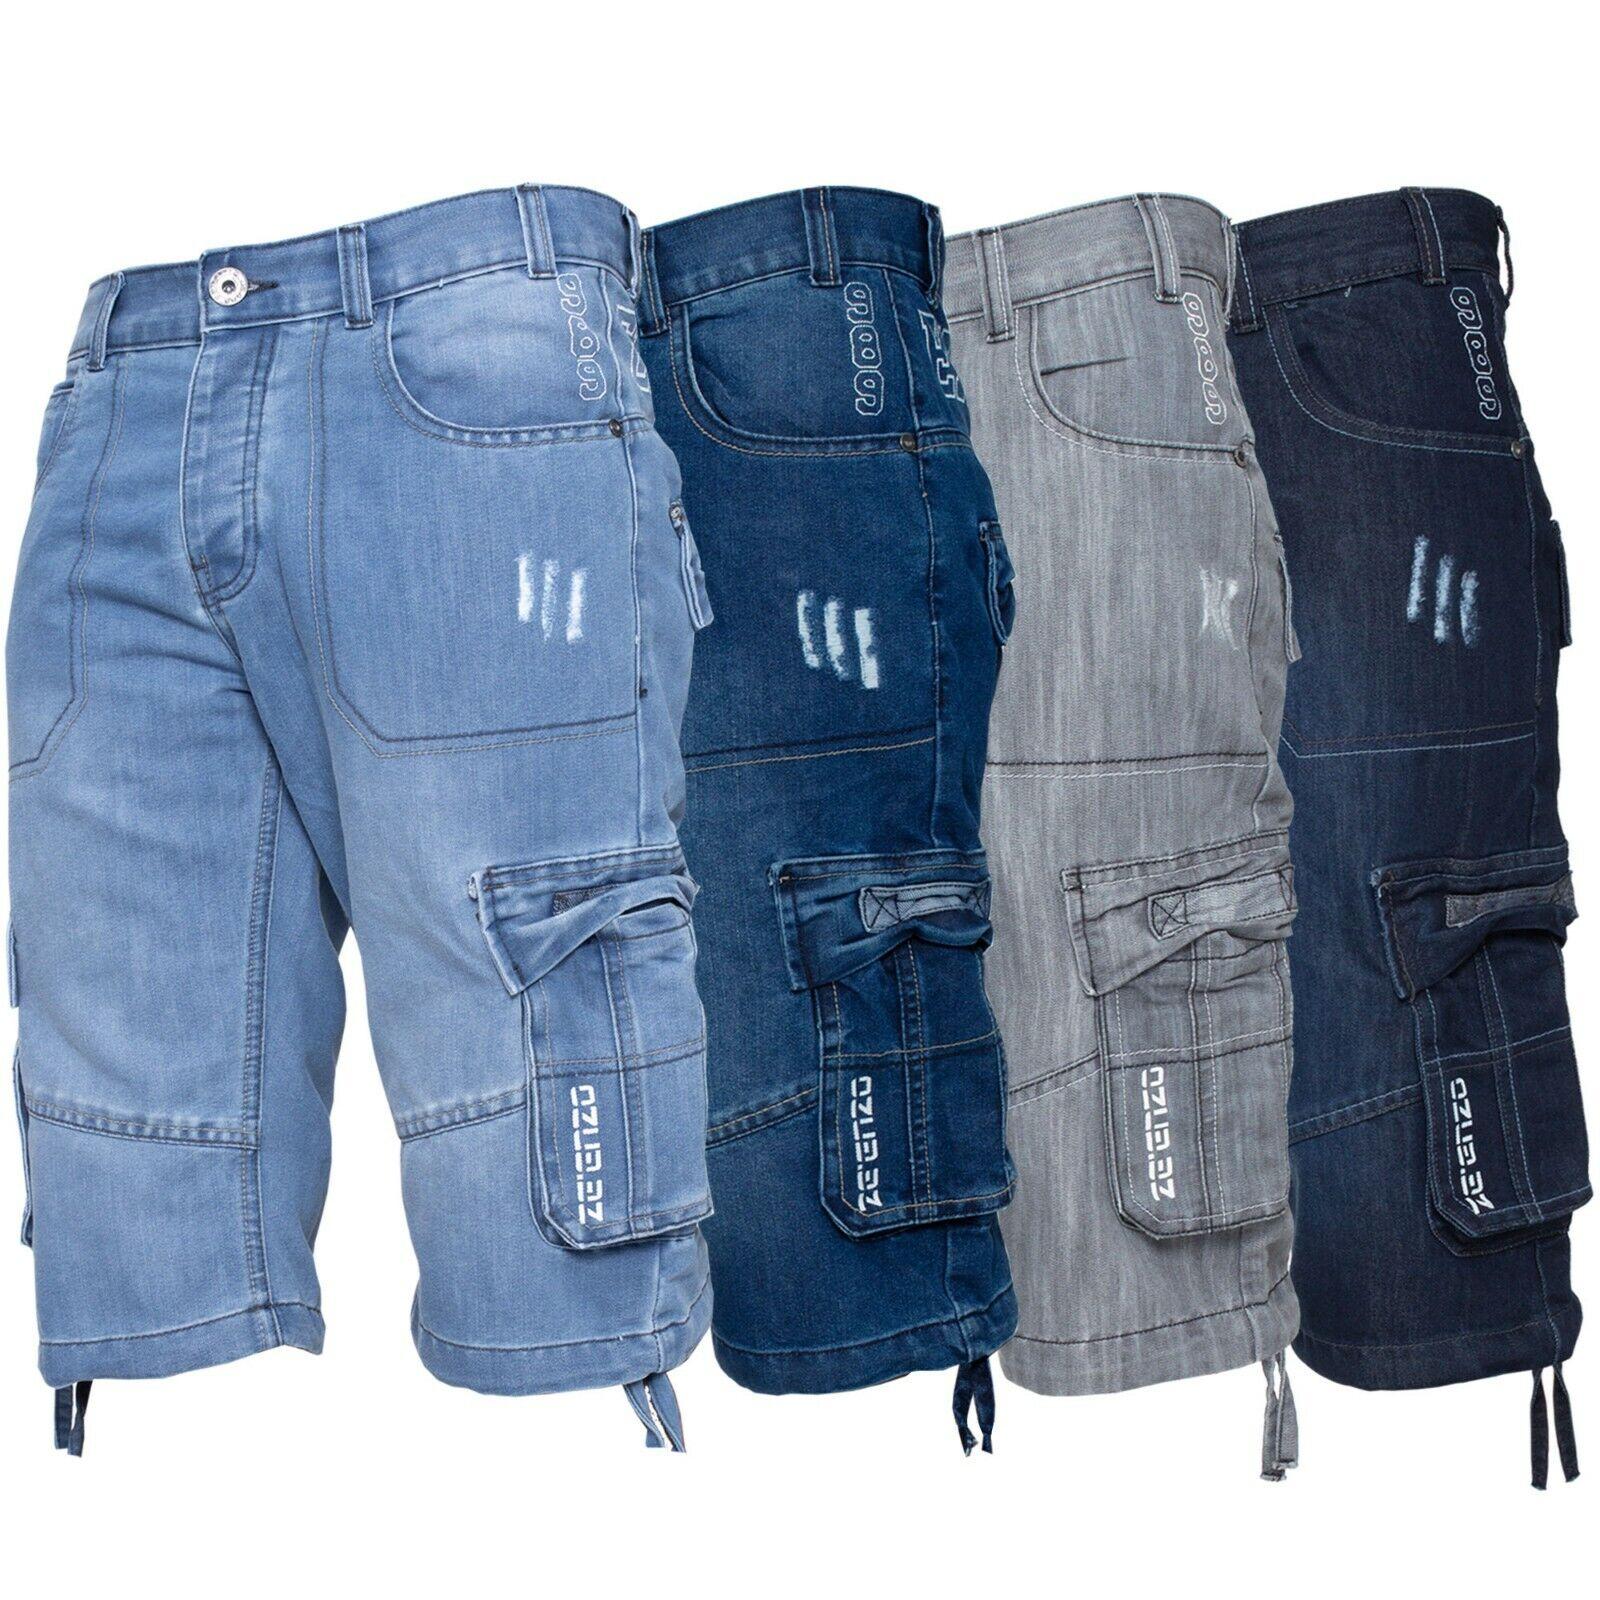 Enzo Jeans Mens Shorts Raw Combat Cargo Pockets Casual Knee